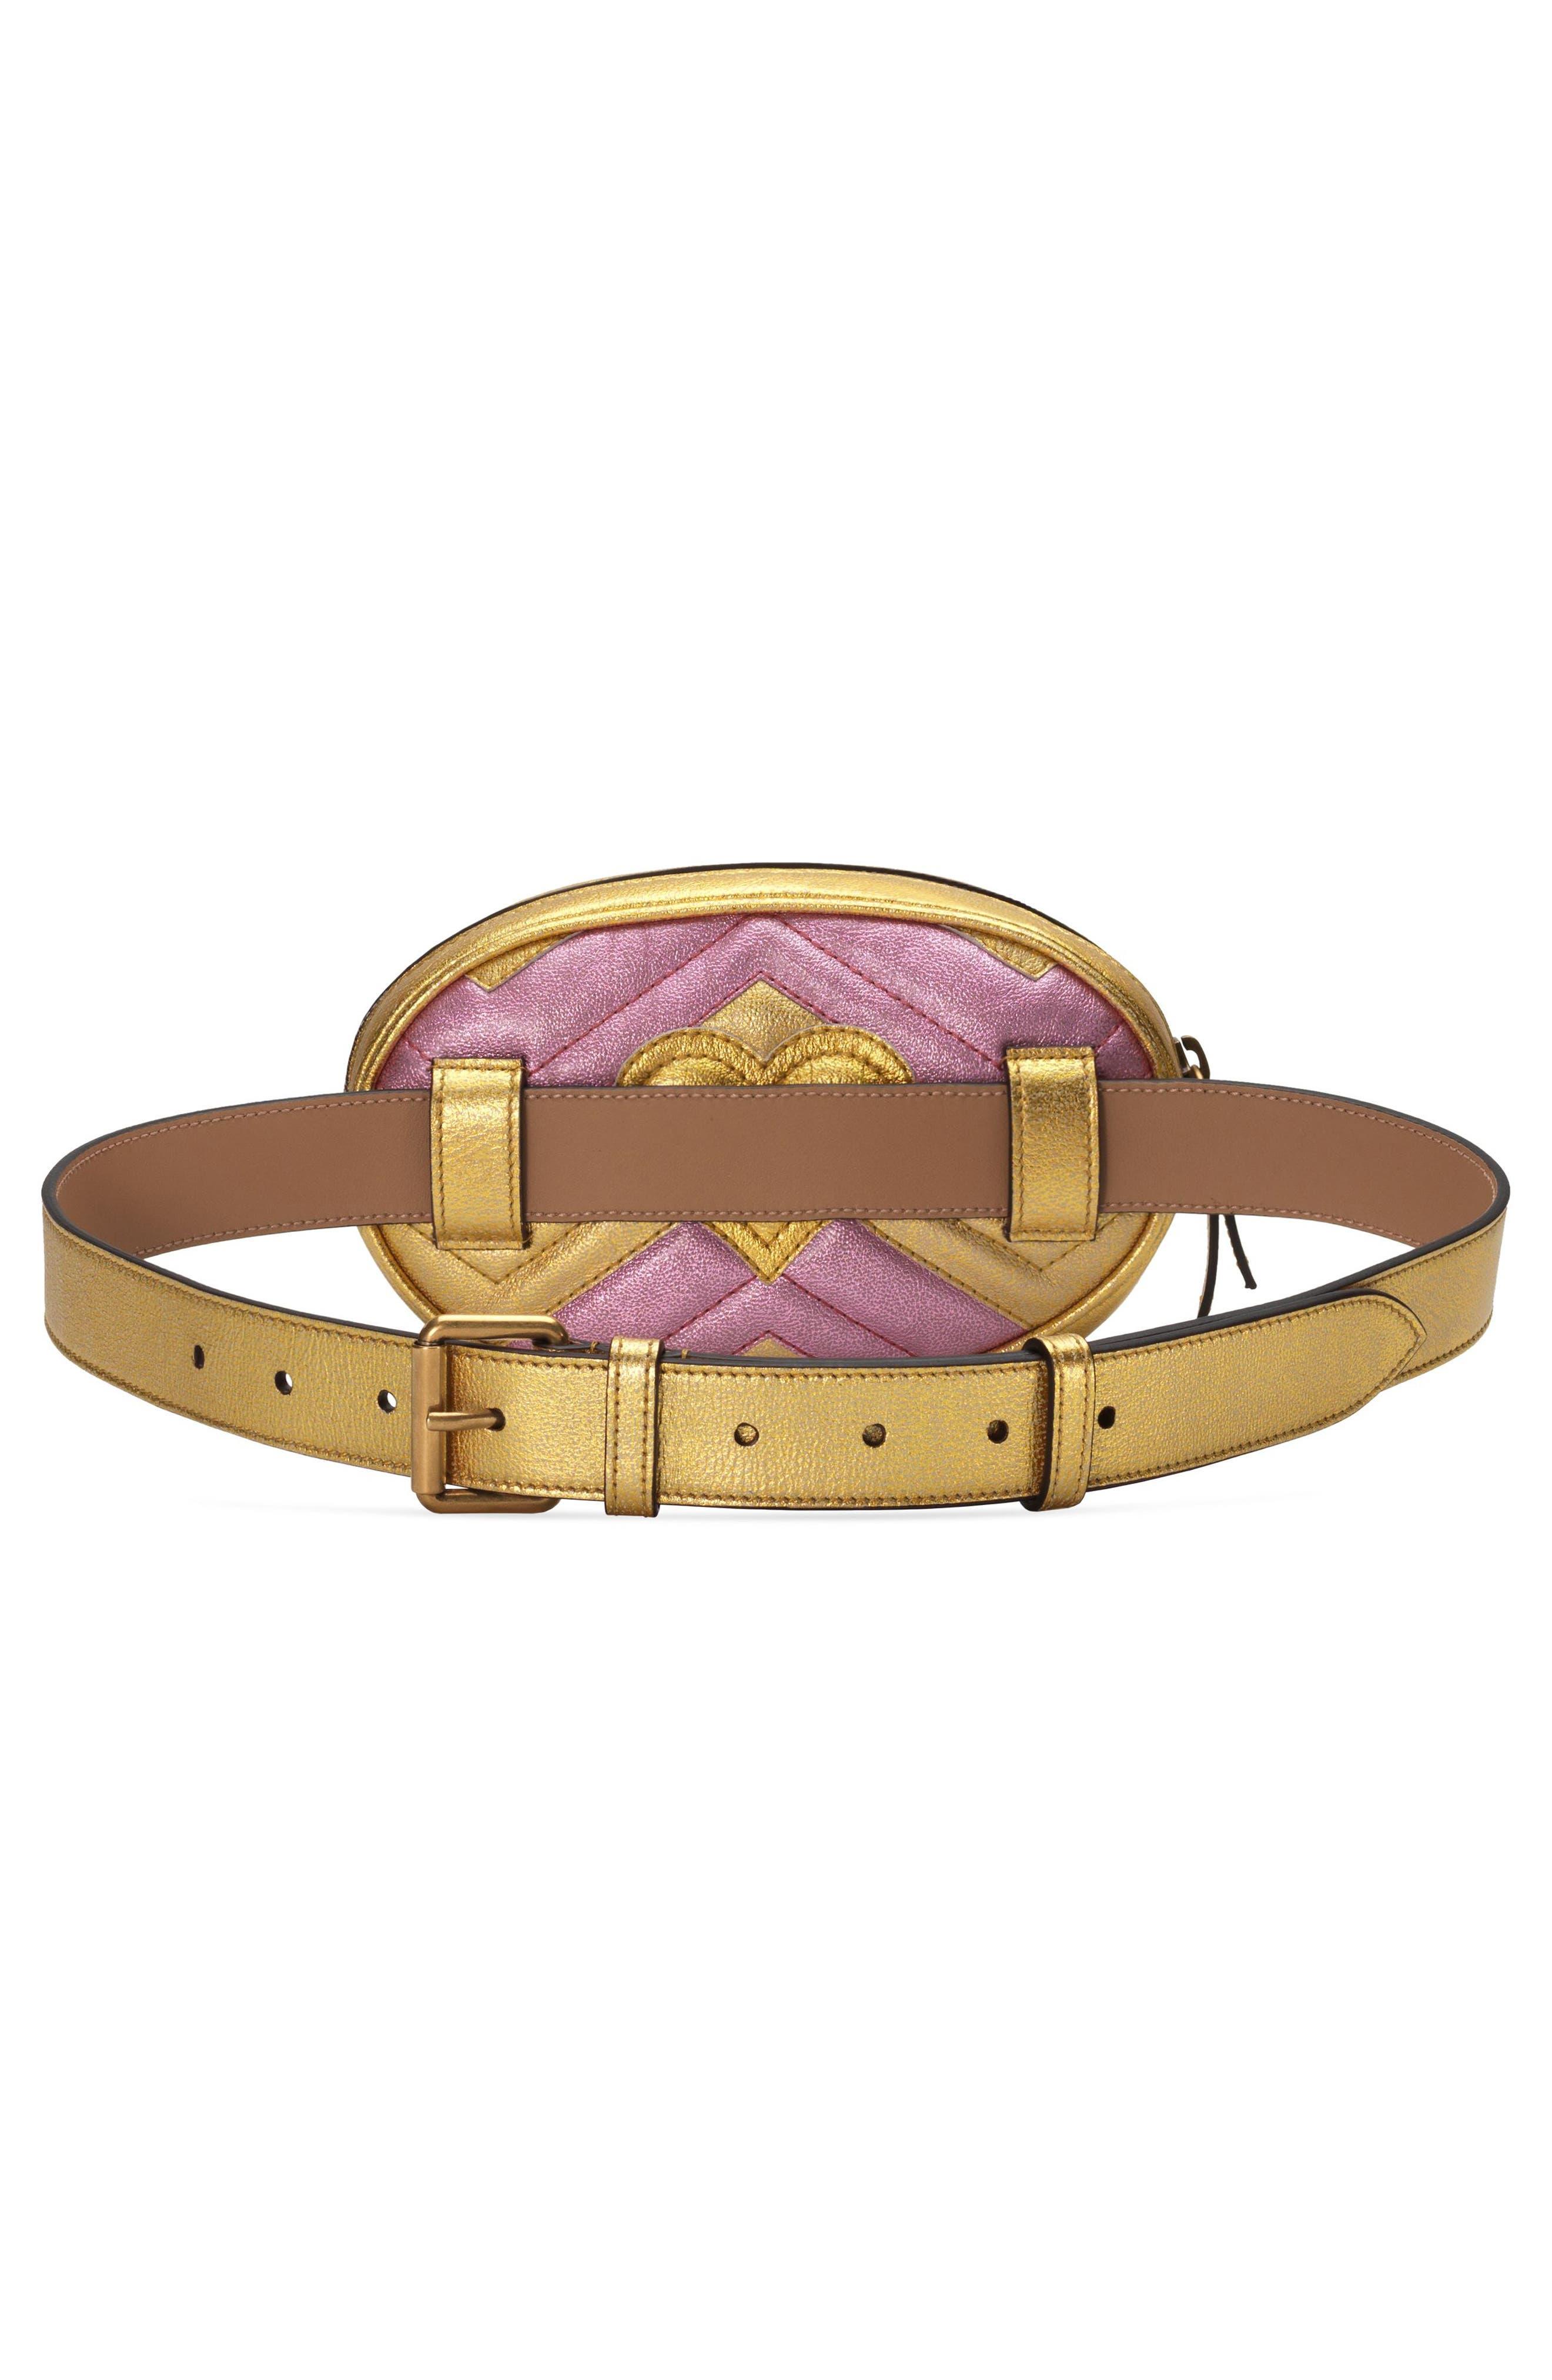 Marmont 2.0 Leather Belt Bag,                             Alternate thumbnail 2, color,                             710